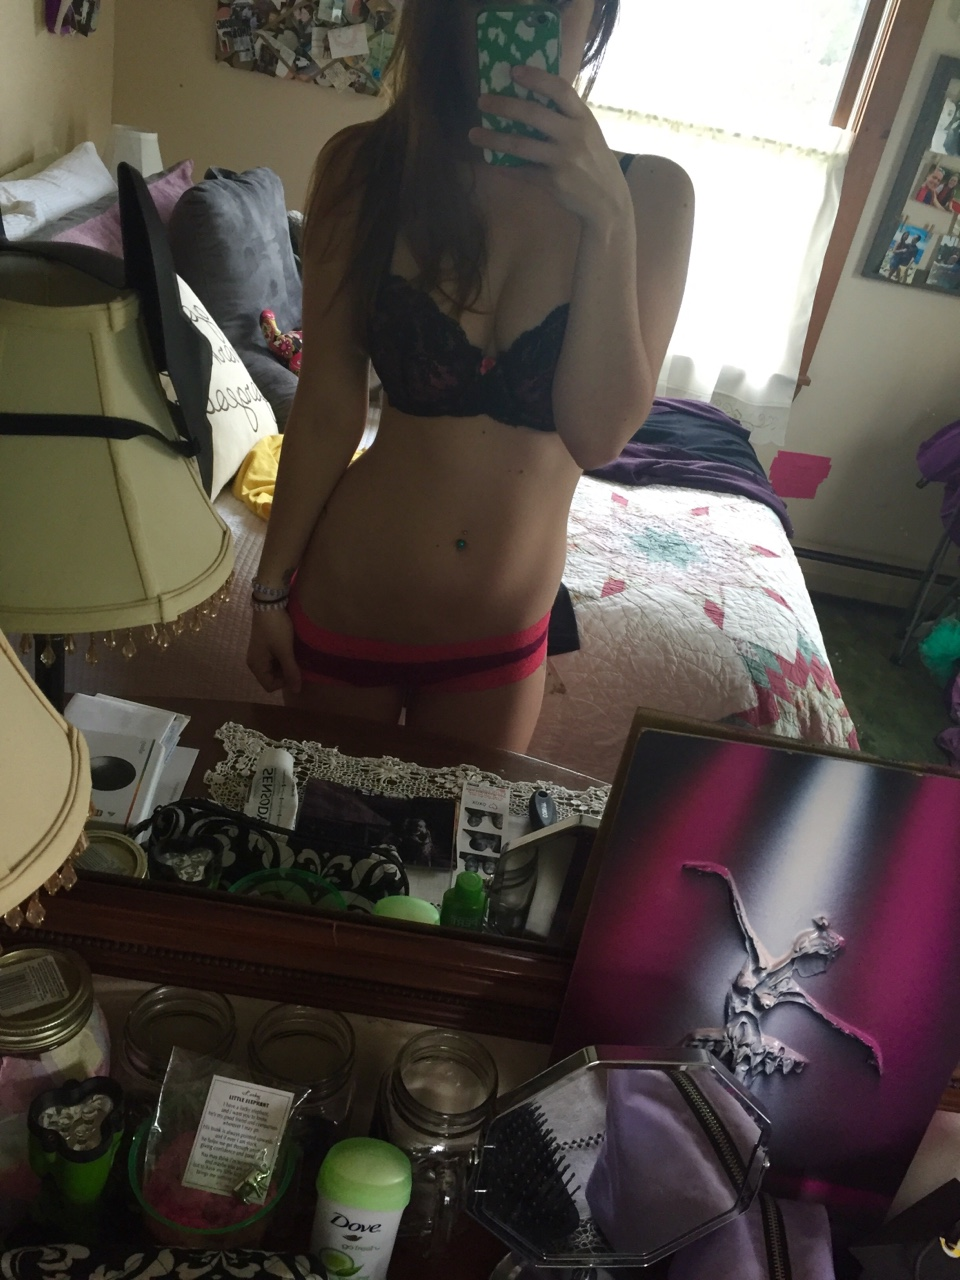 femme du 10 selfie sexy cherche son plan q